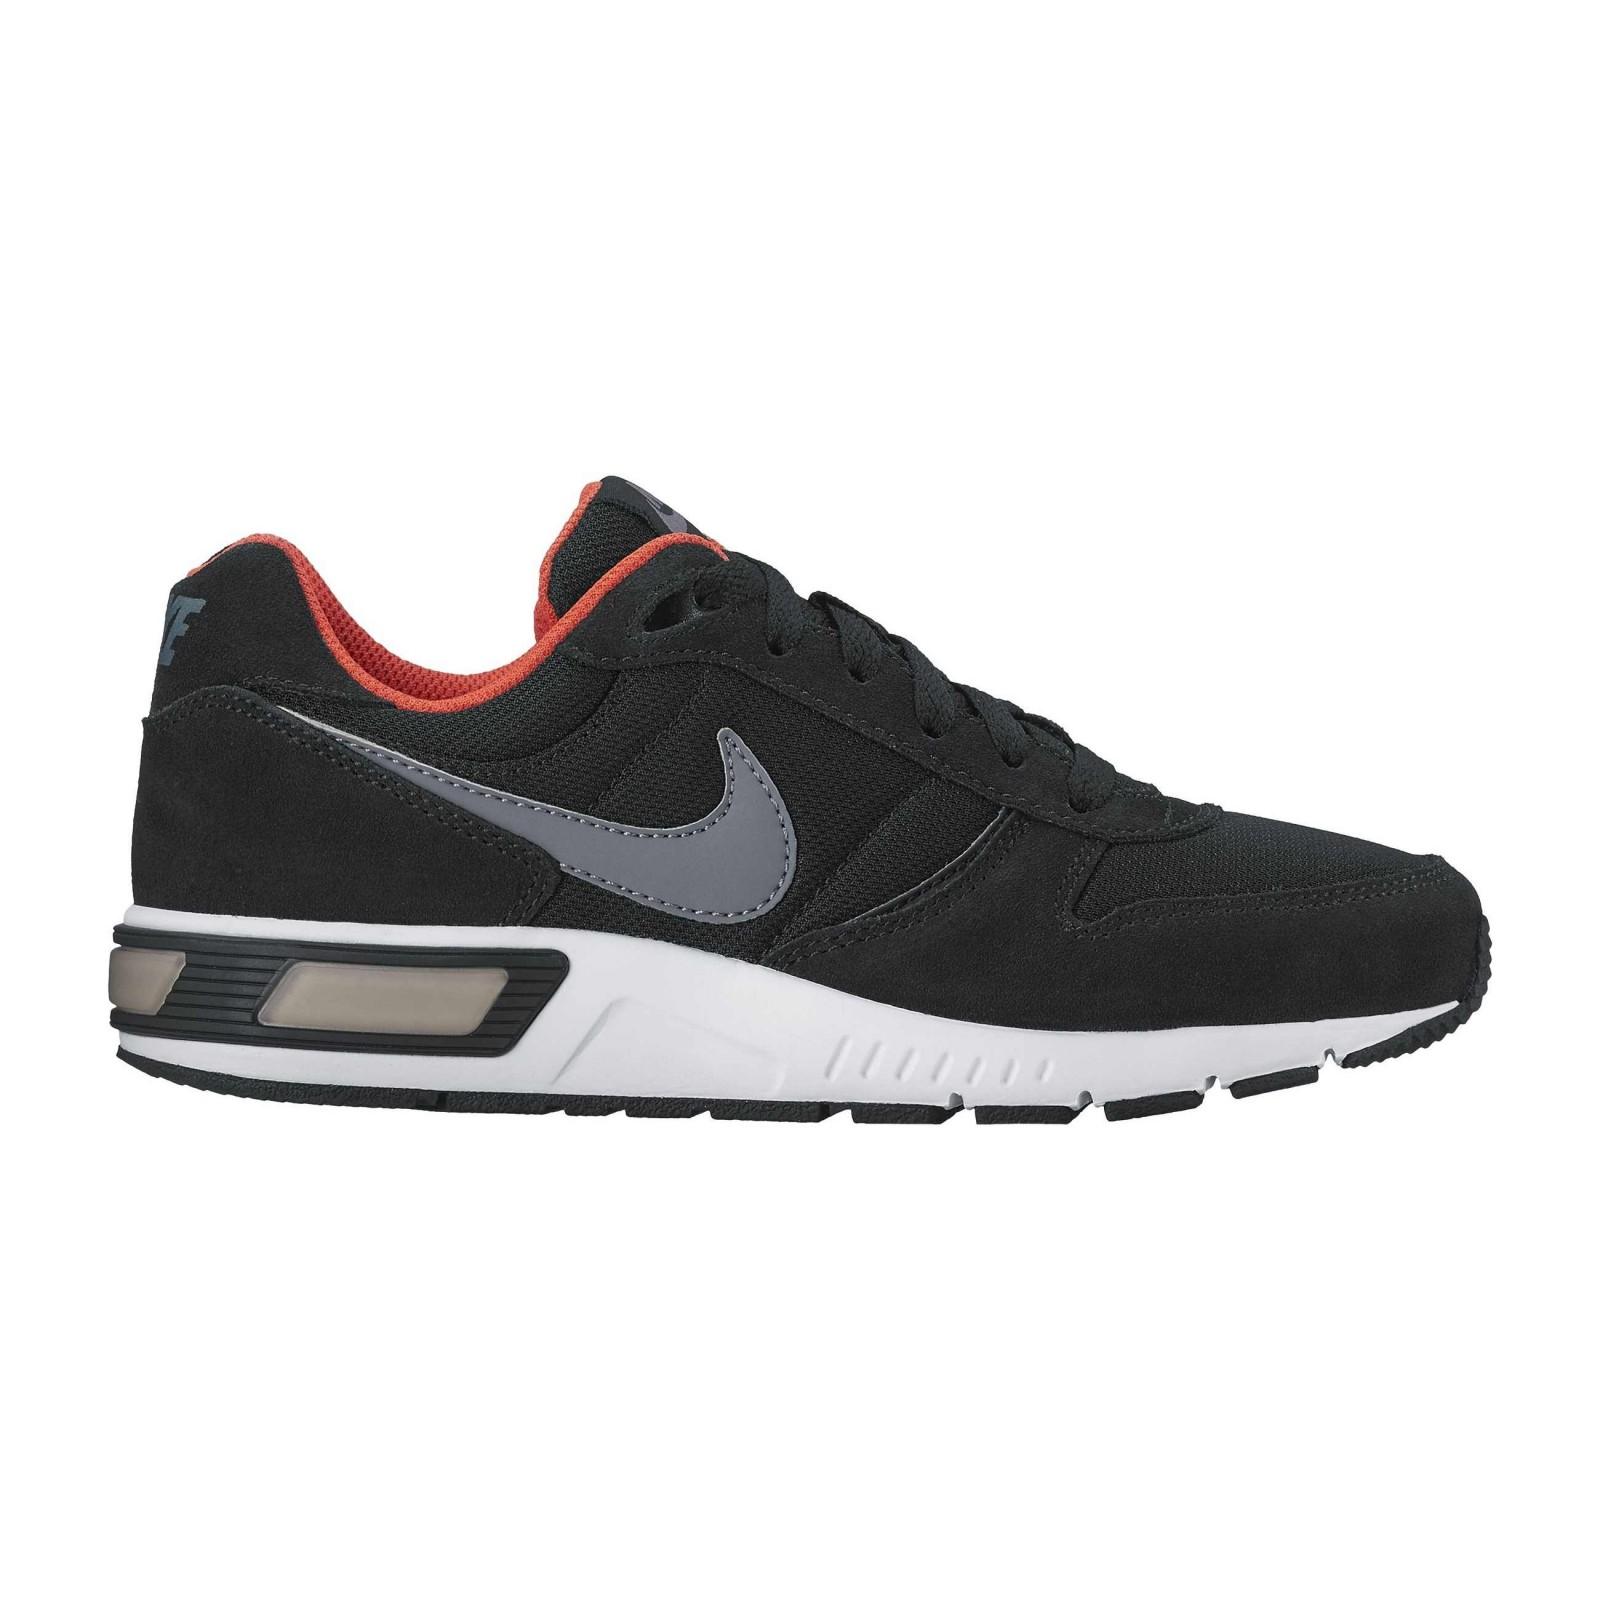 e9e0f0686f Dětské tenisky Nike NIGHTGAZER (GS)